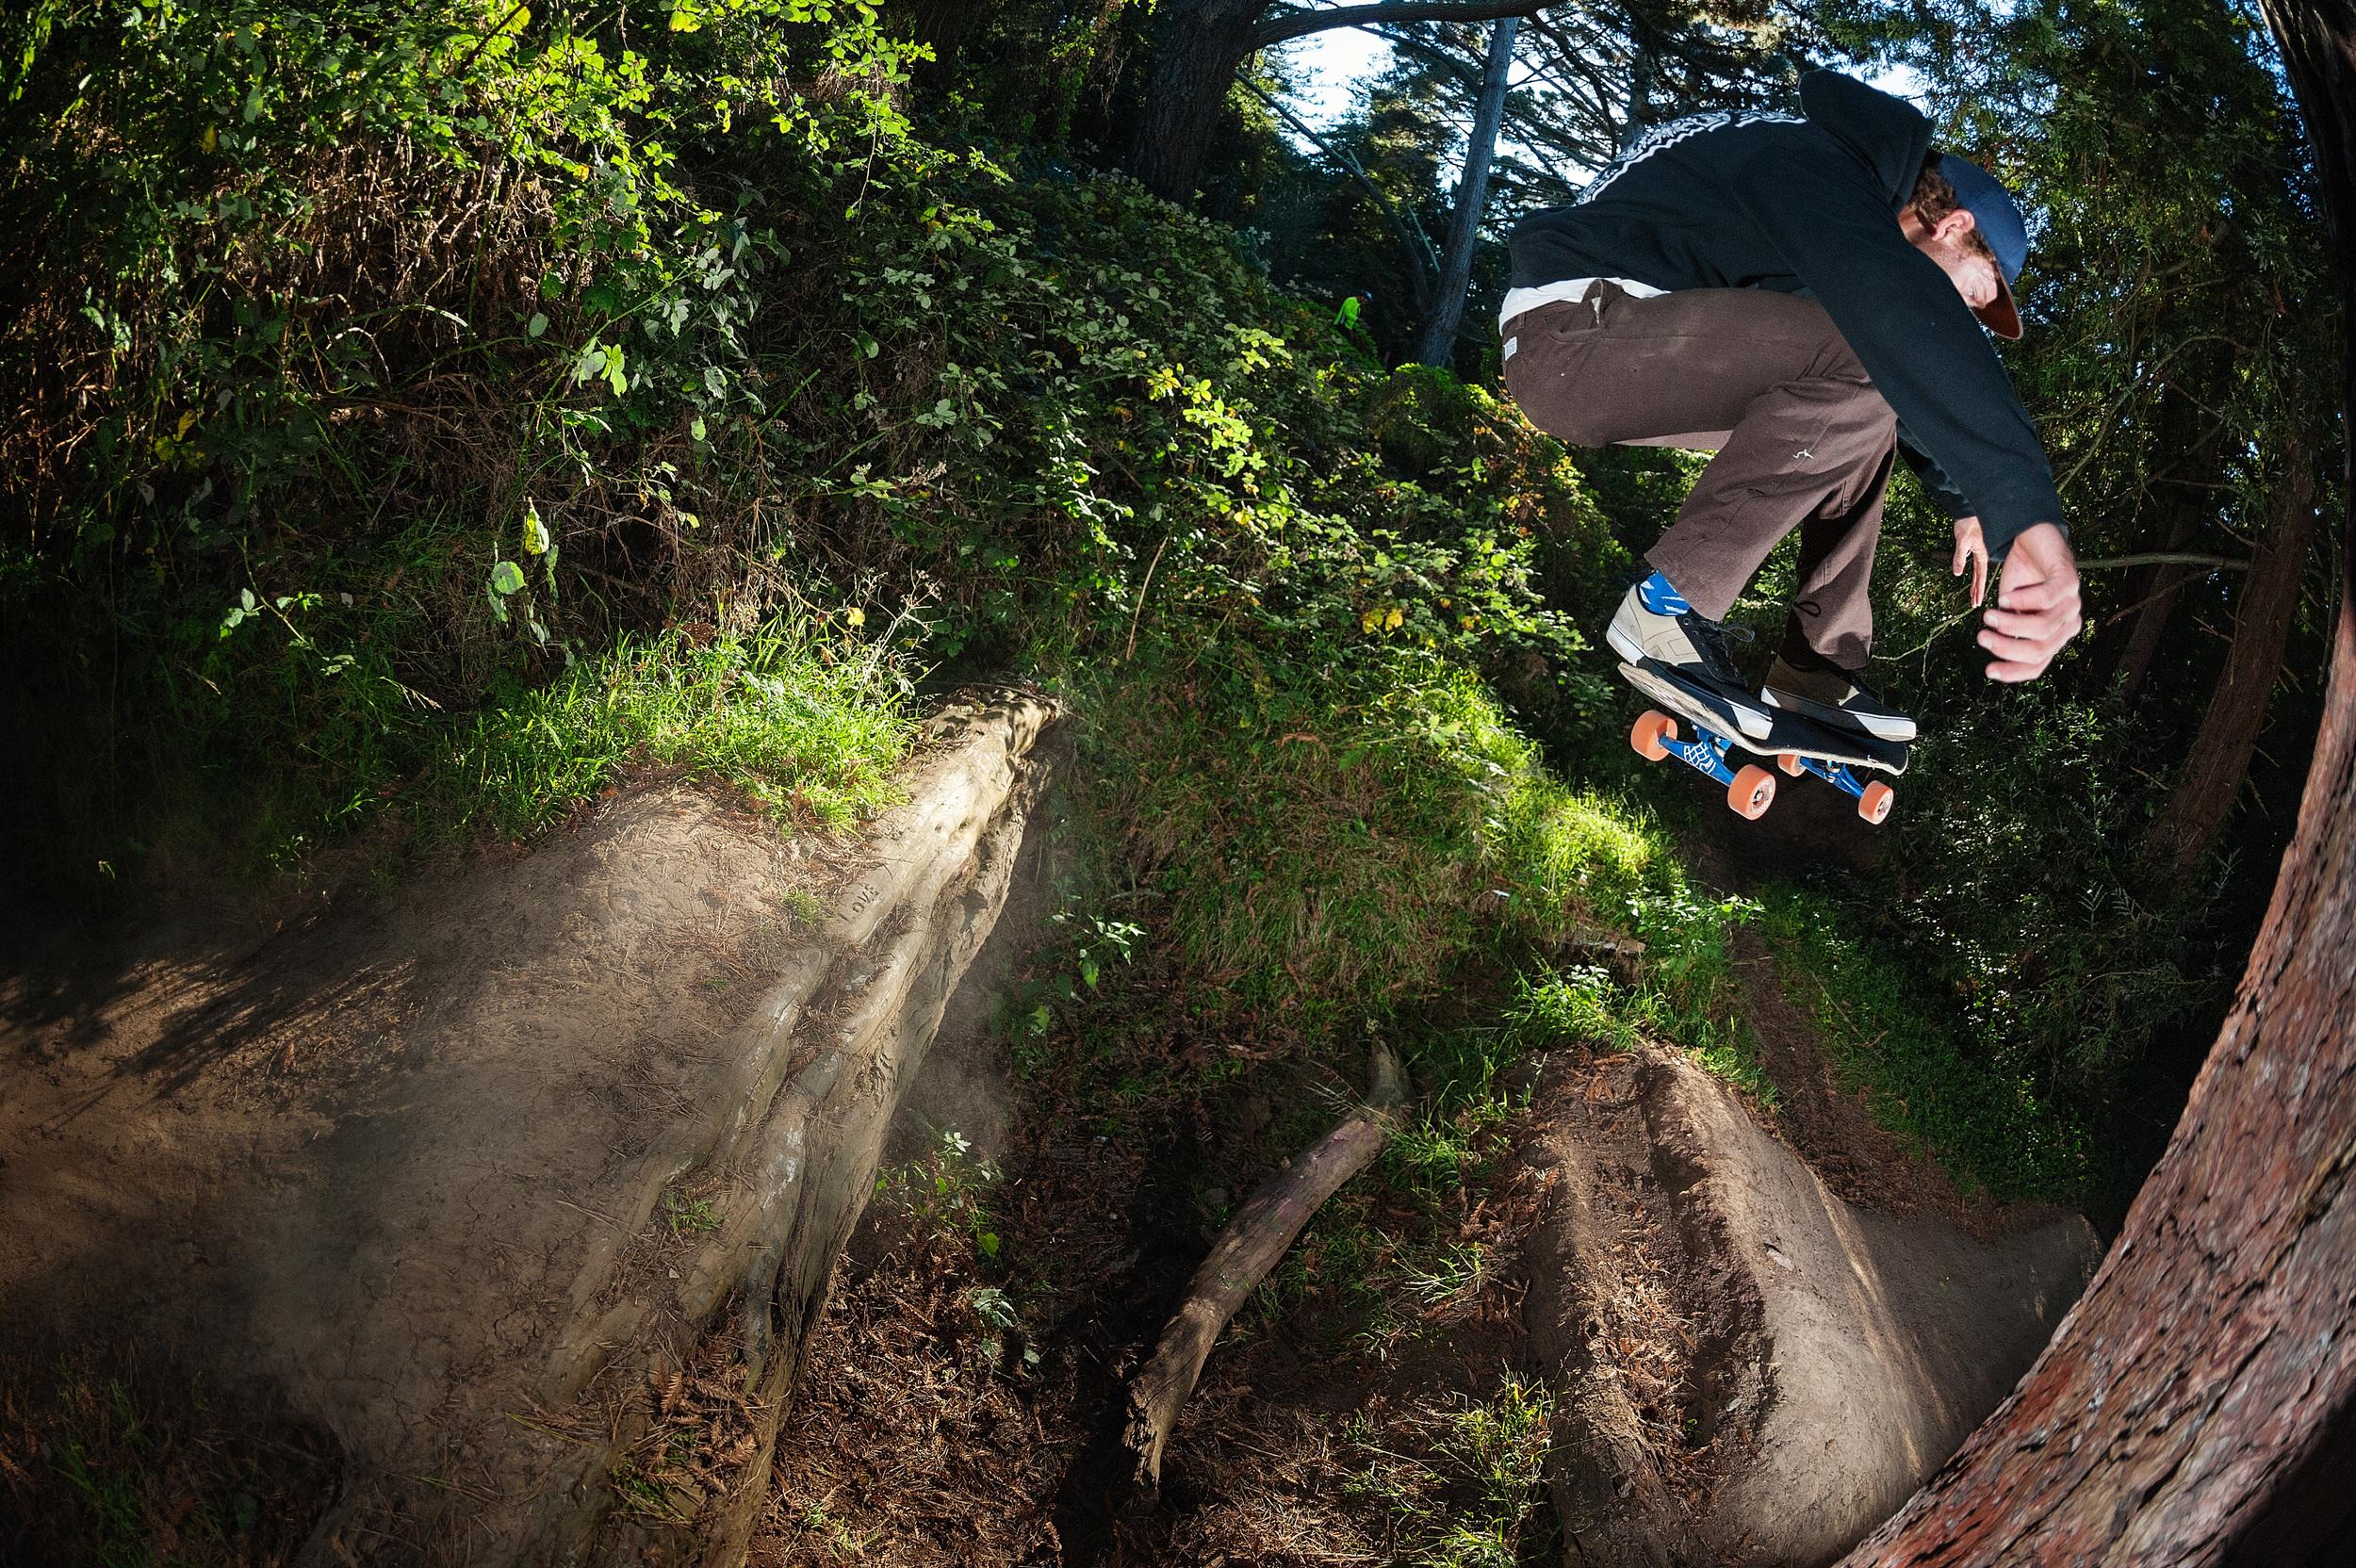 Josh Matthews